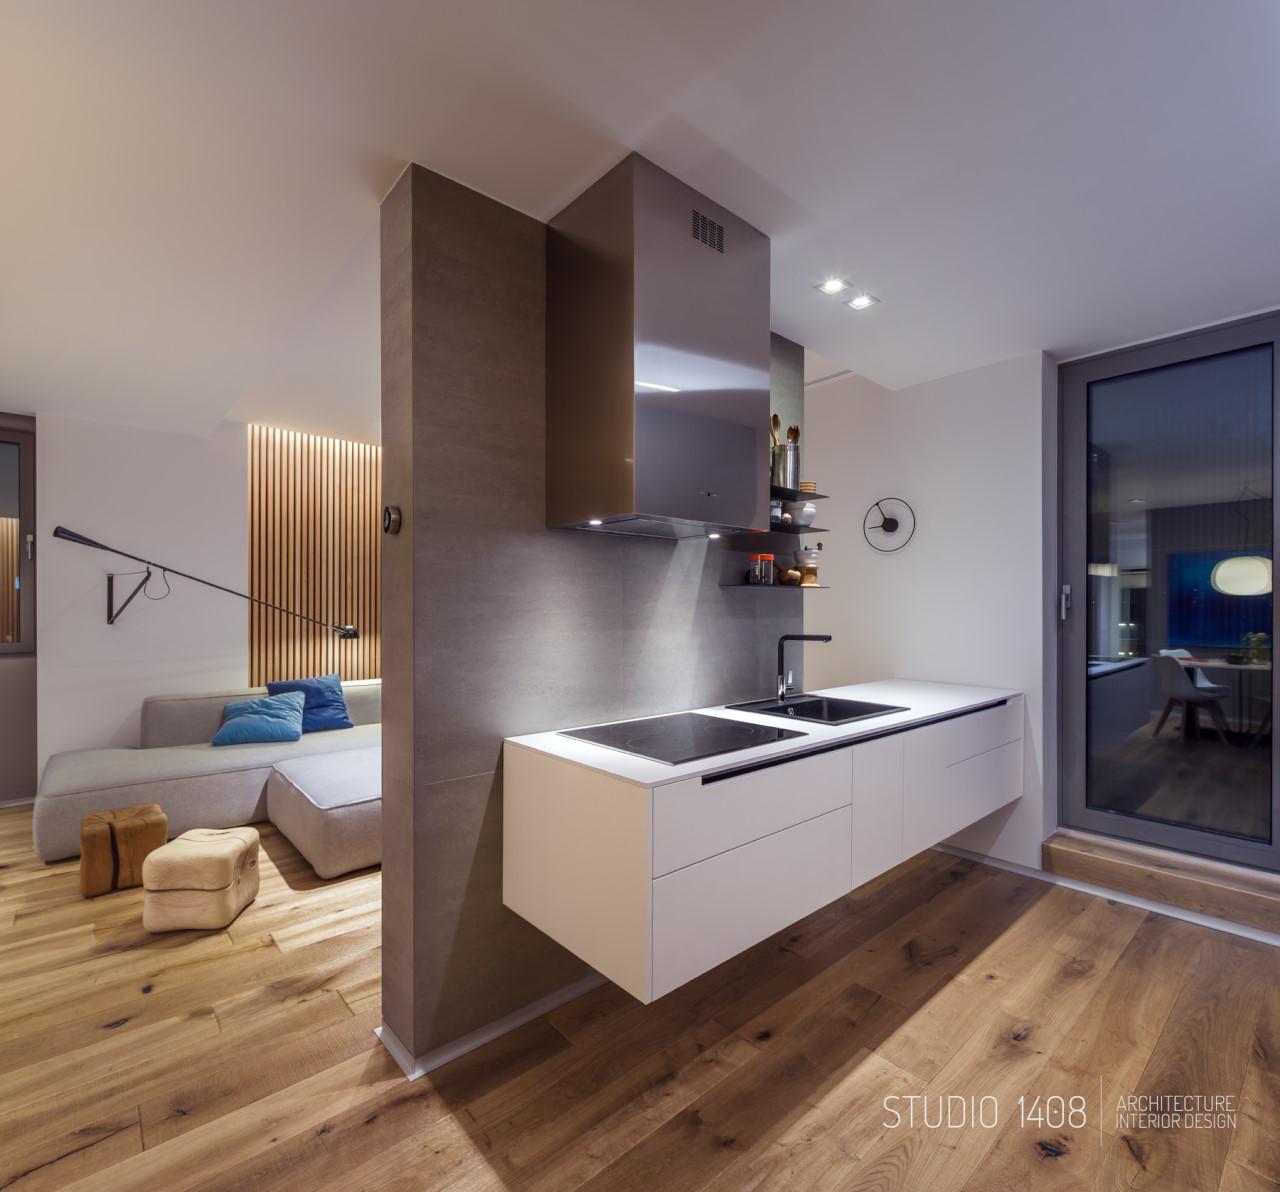 Apartment By Studio 1408 In Bucharest . 2016 Http://Www.Studio1408.Com/